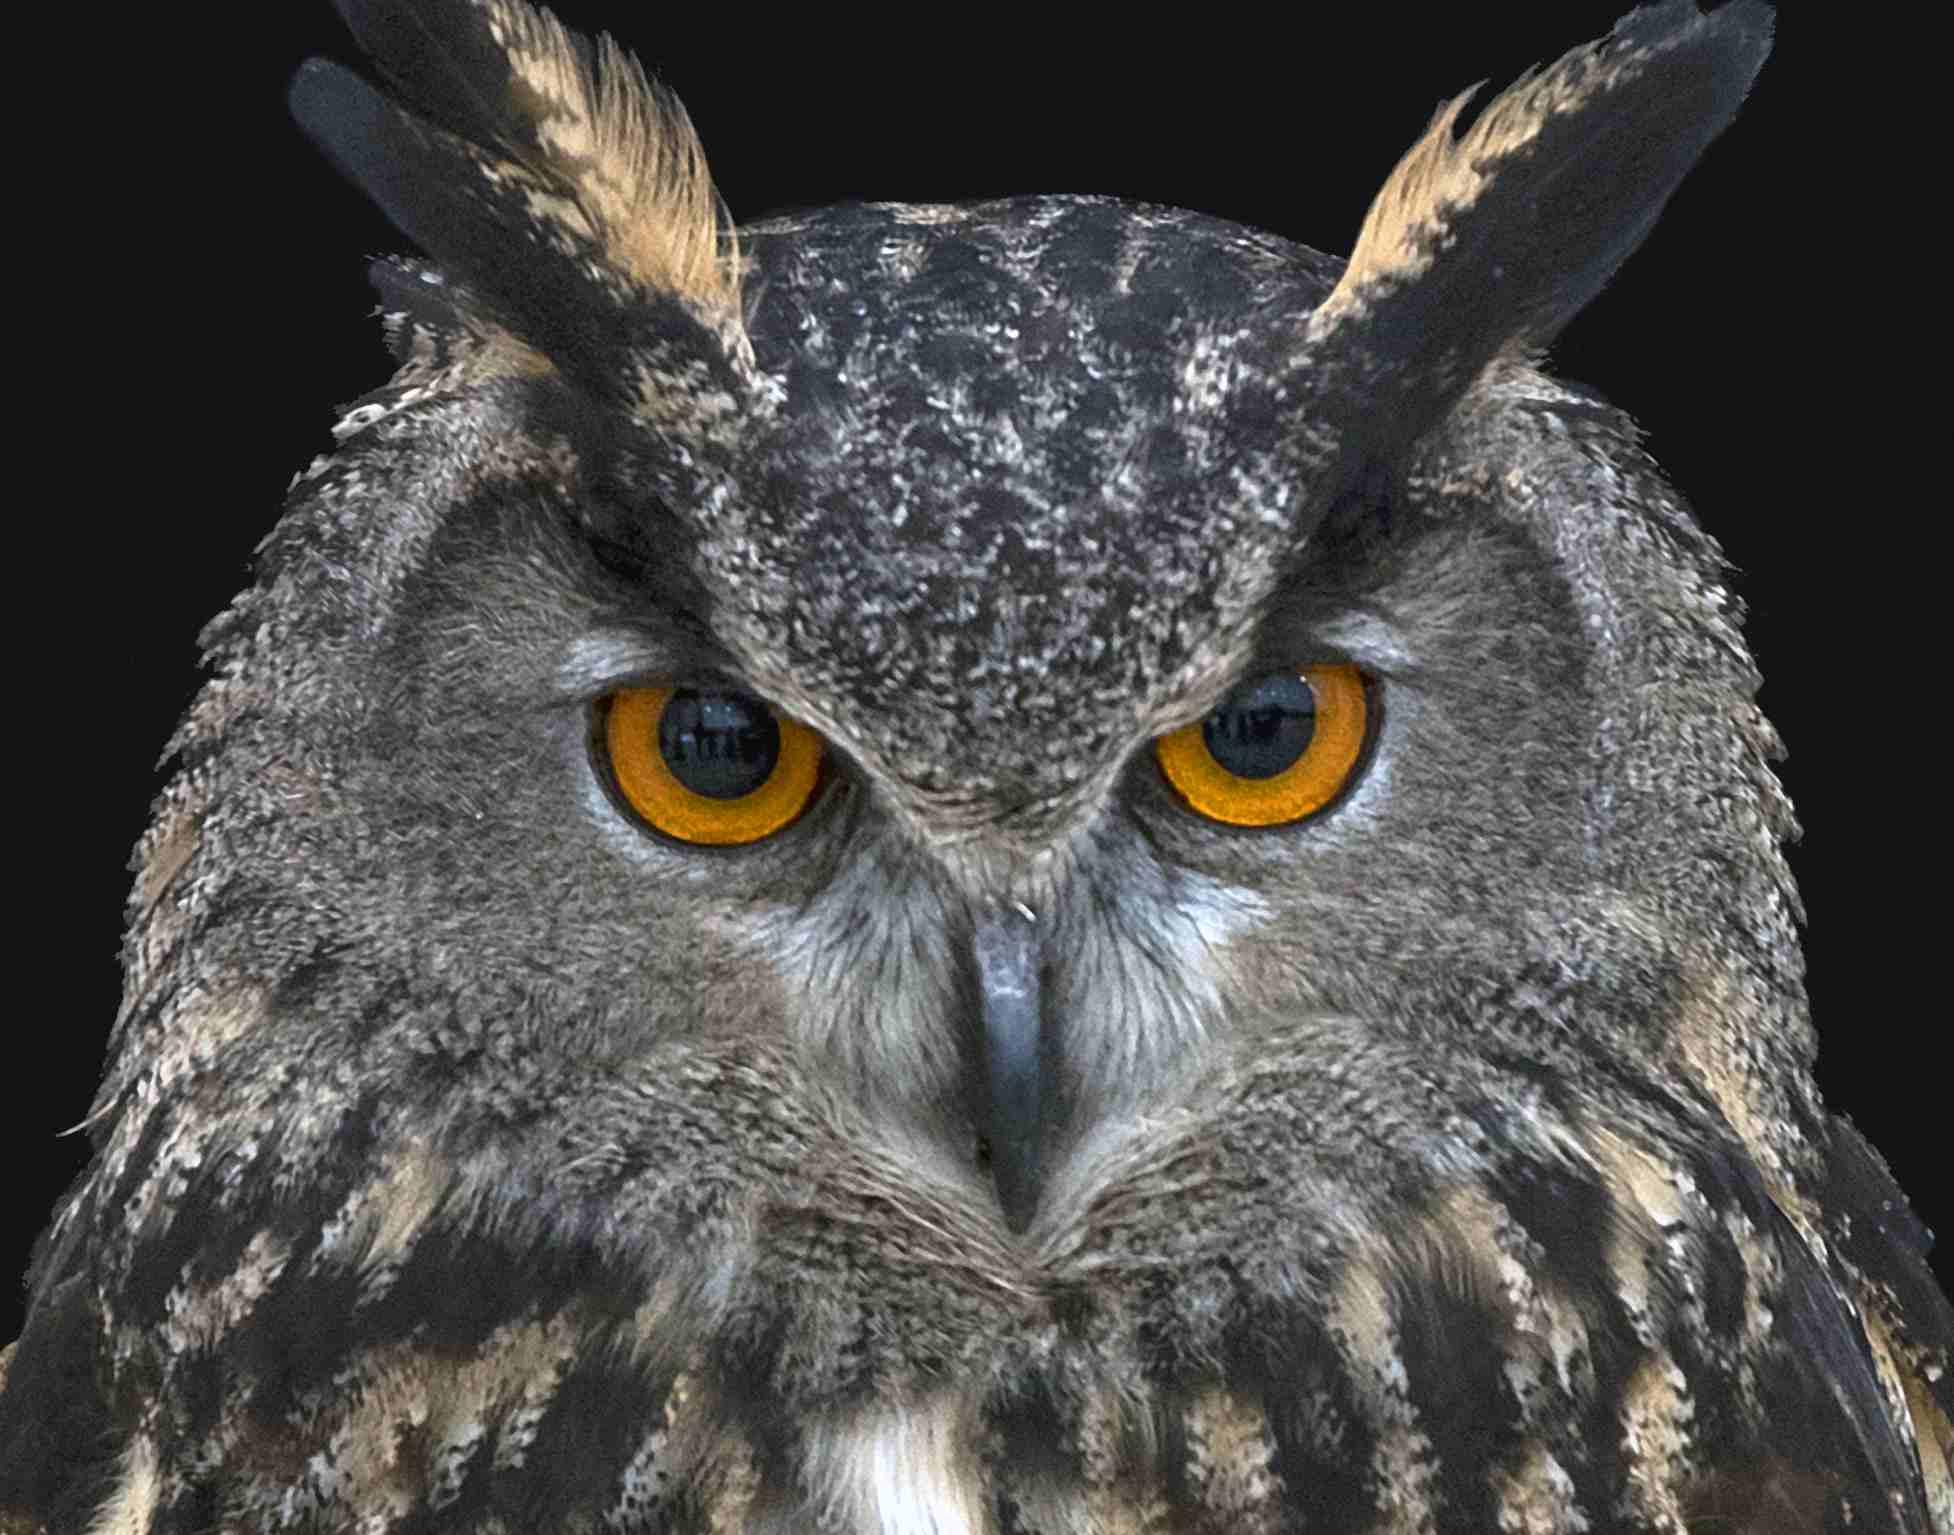 Ear tufts of an owl